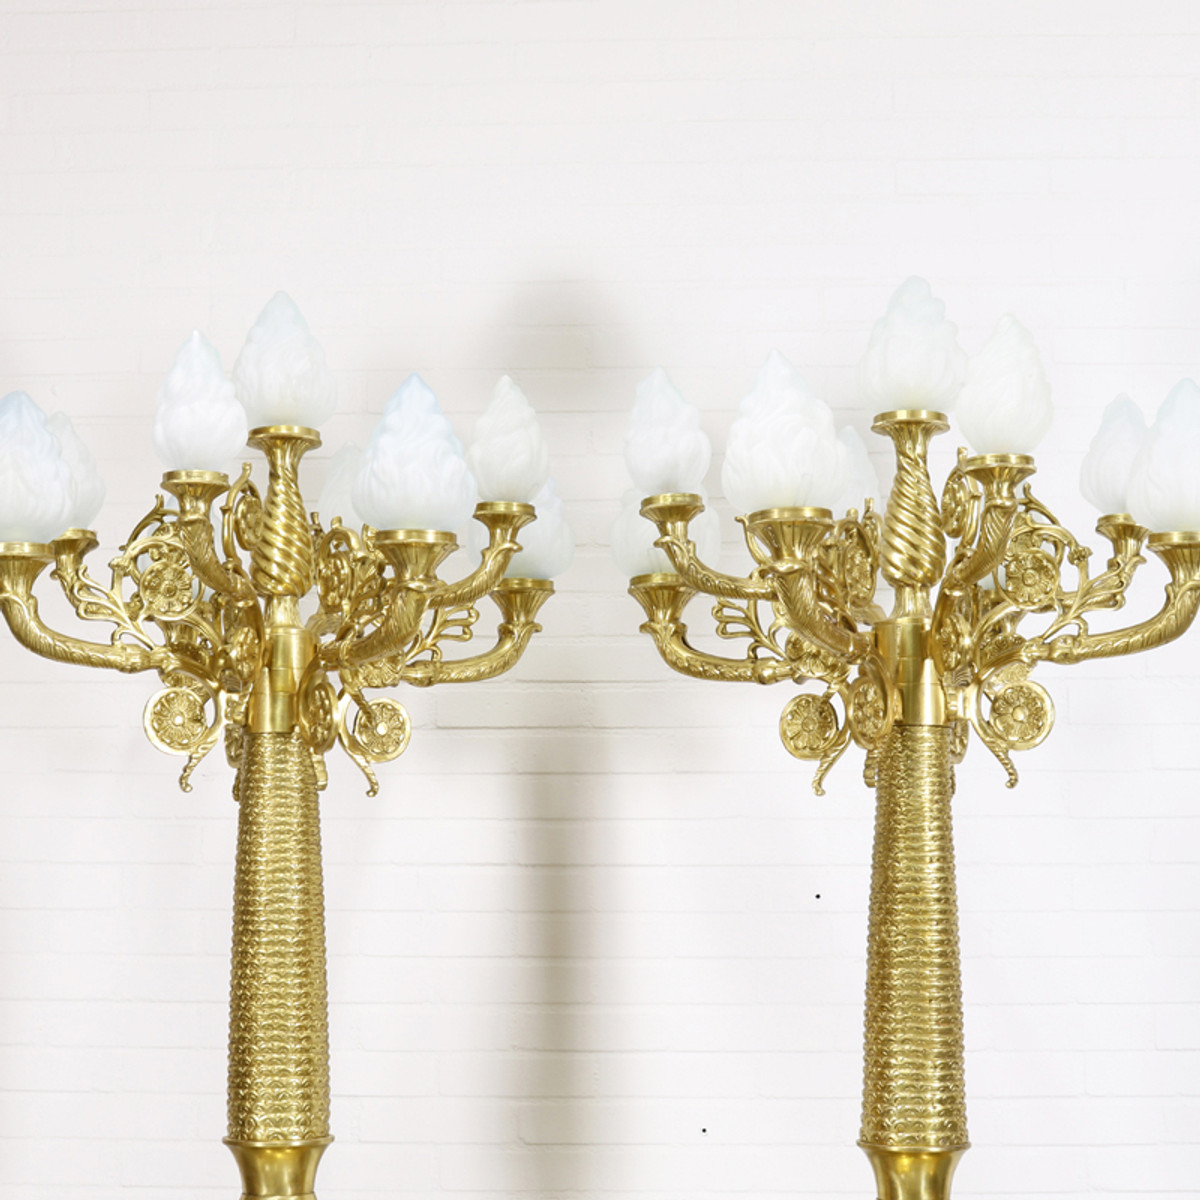 Casa Padrino Barock Stand Kronleuchter Mit Marmor Säulen Set Mod1 Creme /  Gold   Edel U0026amp